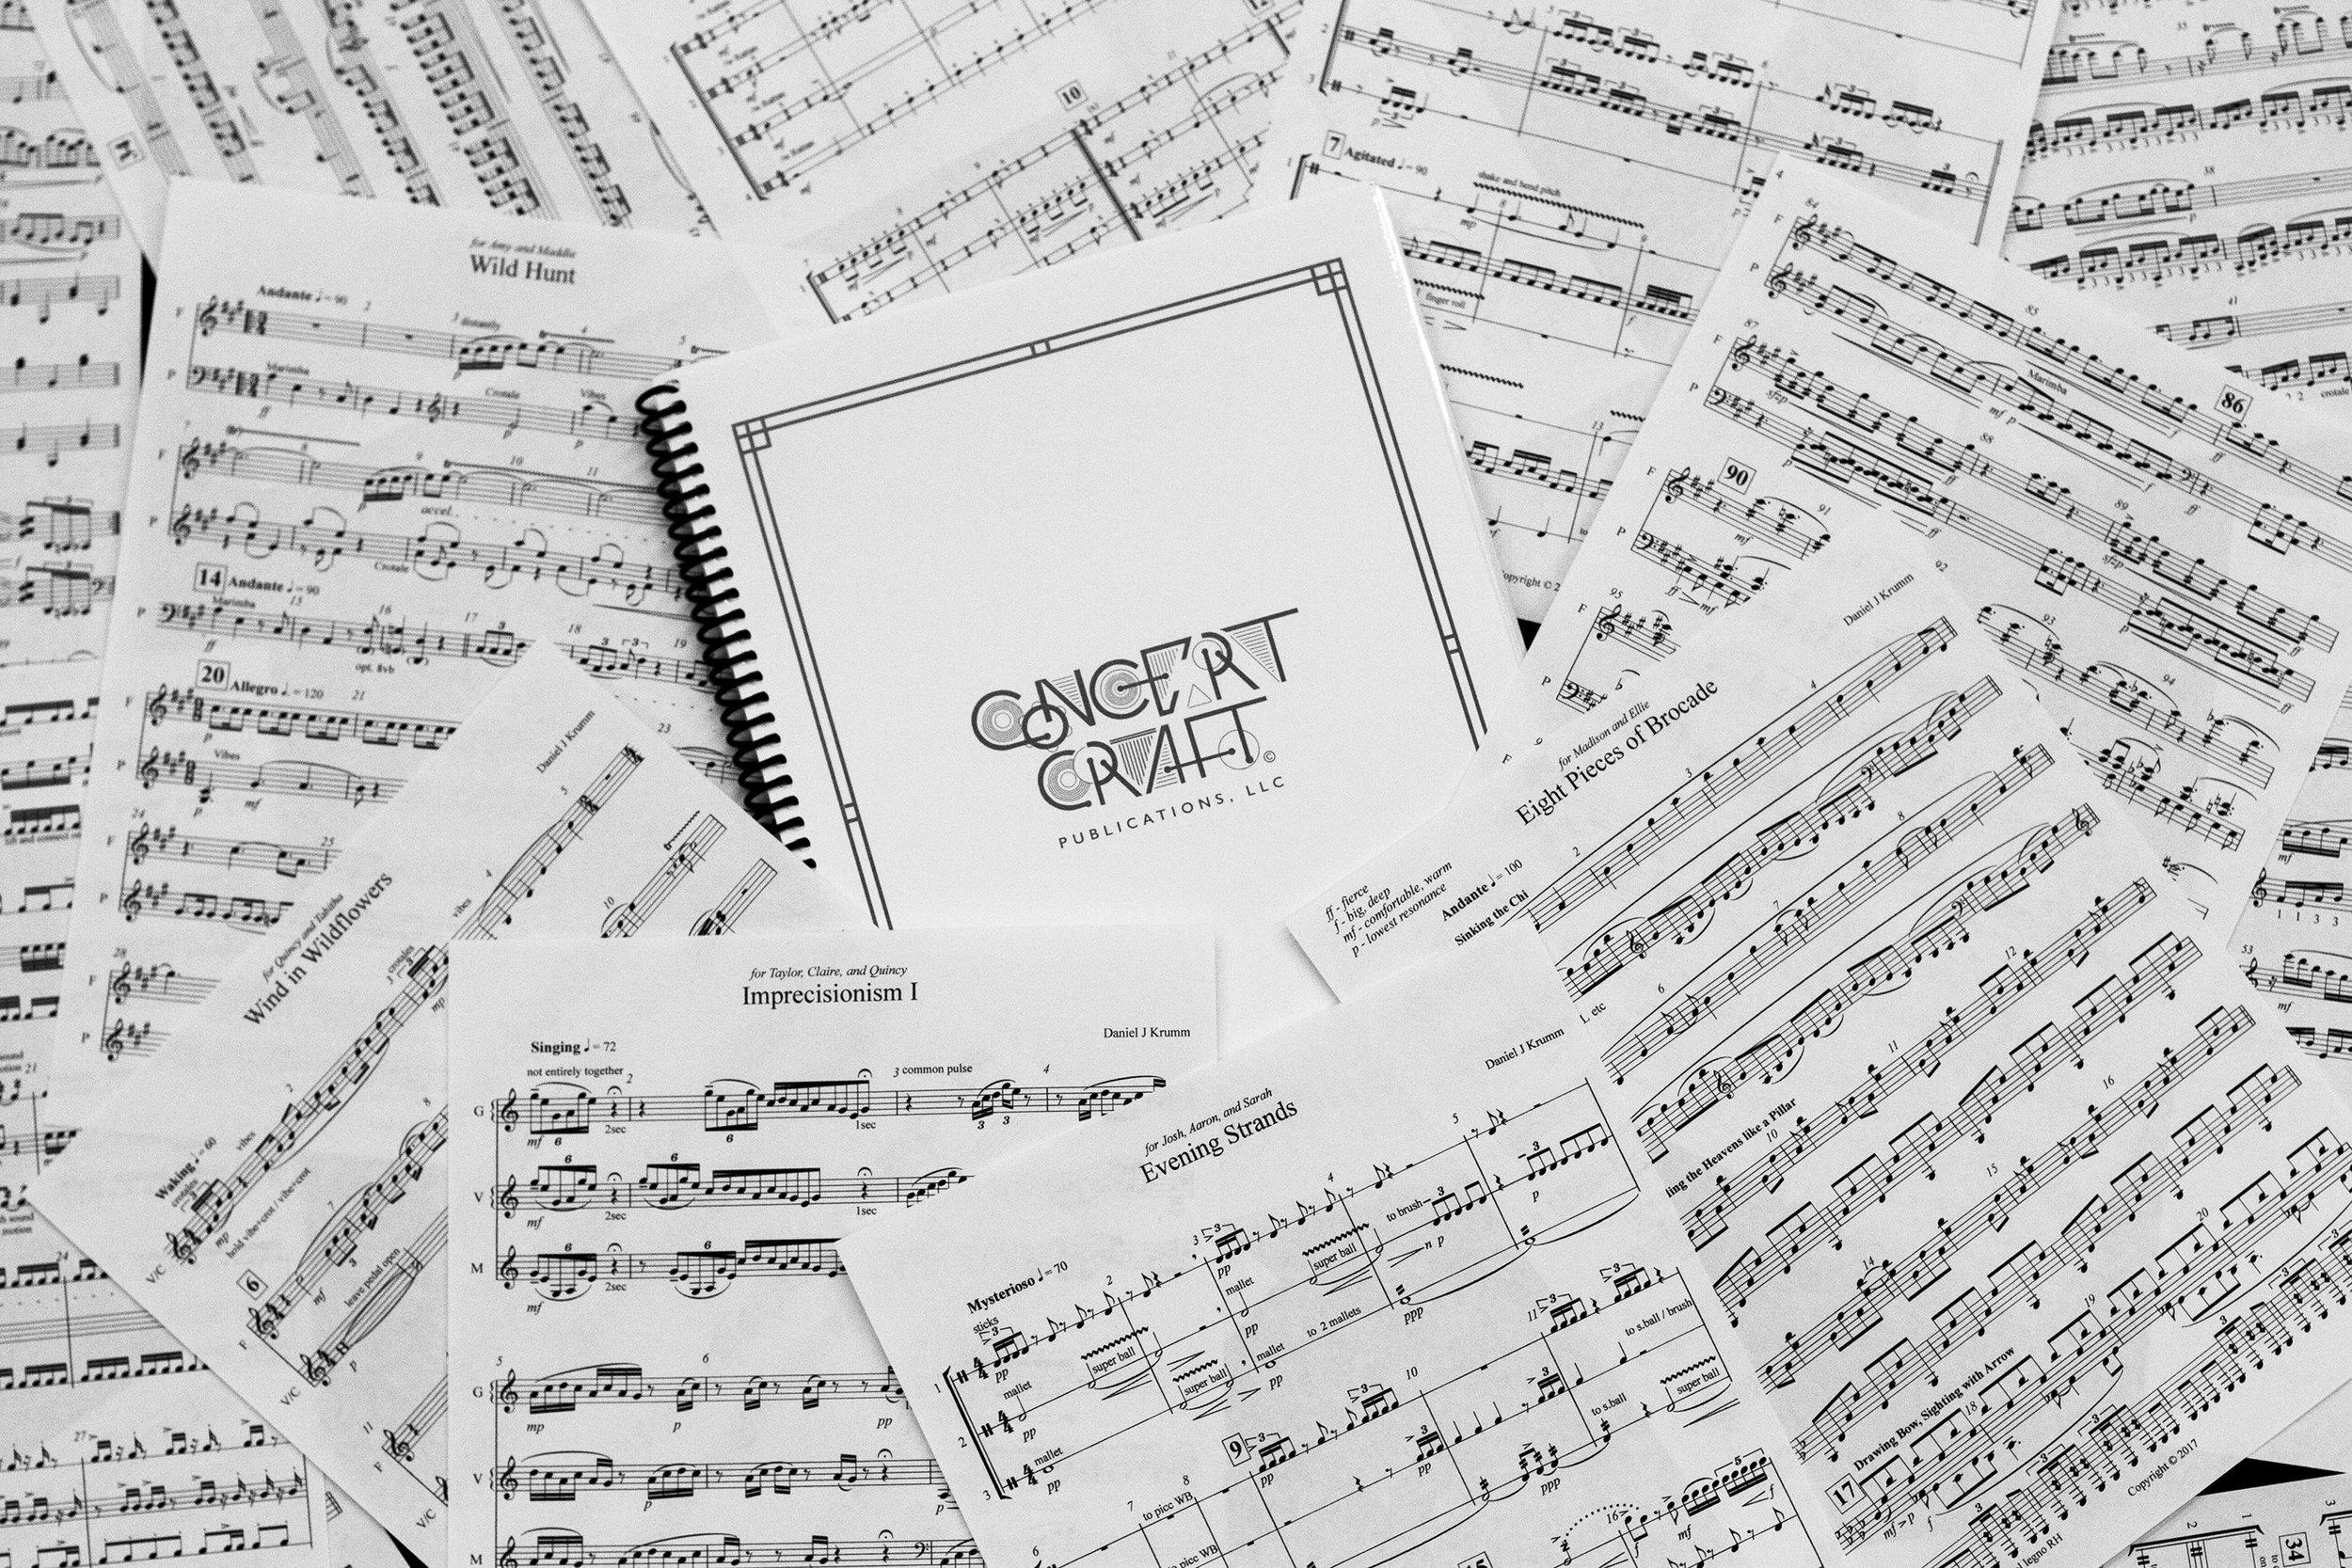 28.ConcertCraft_January2018.jpg